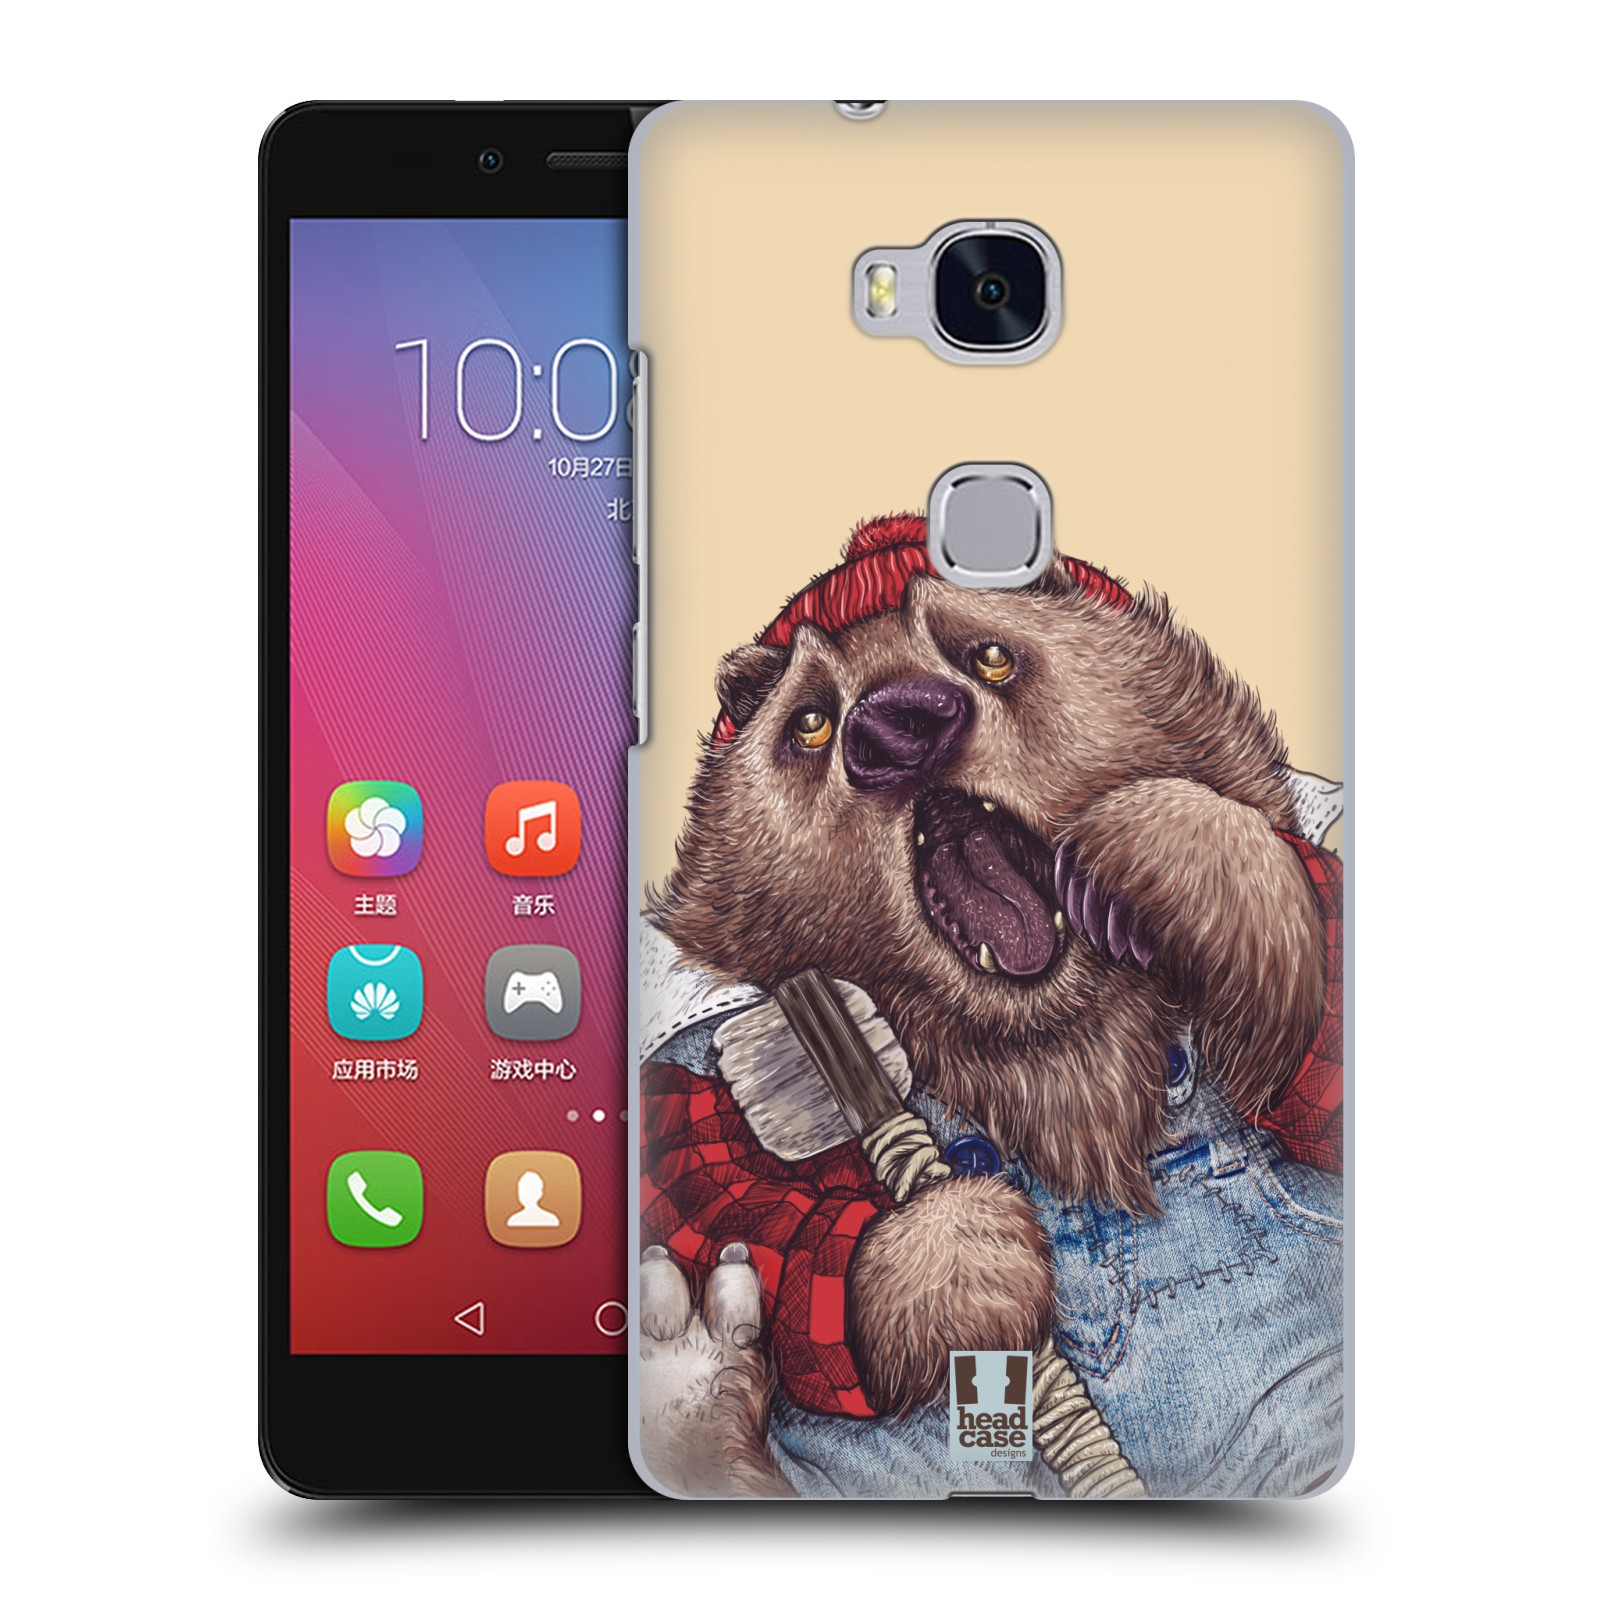 Plastové pouzdro na mobil Honor 5X HEAD CASE ANIMPLA MEDVĚD